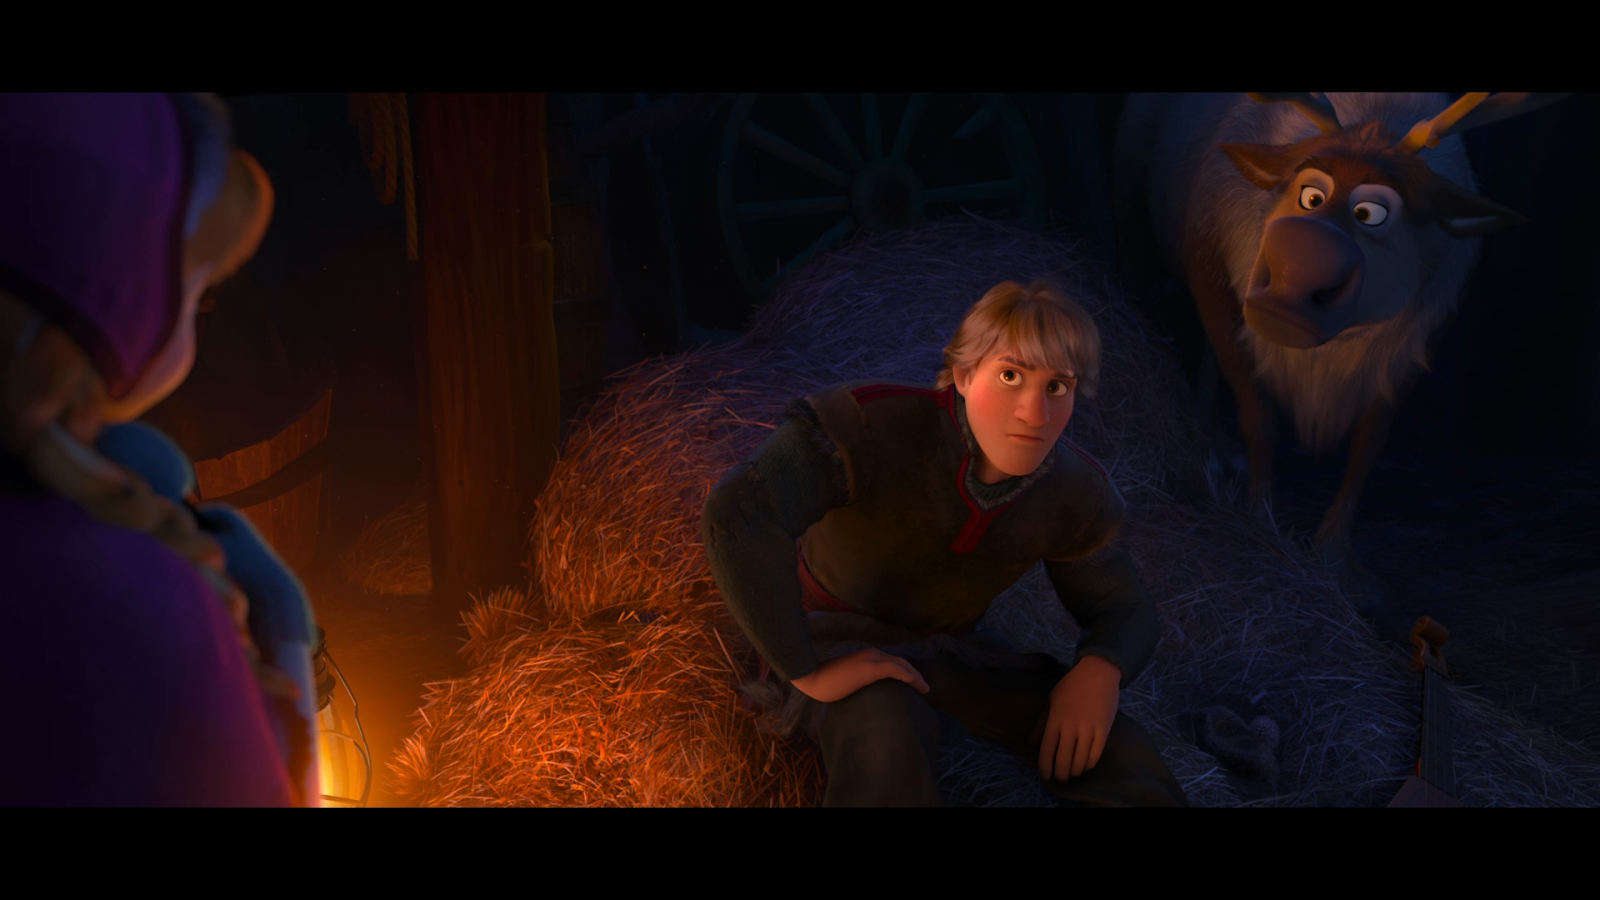 Frozen: Una Aventura Congelada (2013) BRRip 720p Latino-Castellano-Ingles captura 2